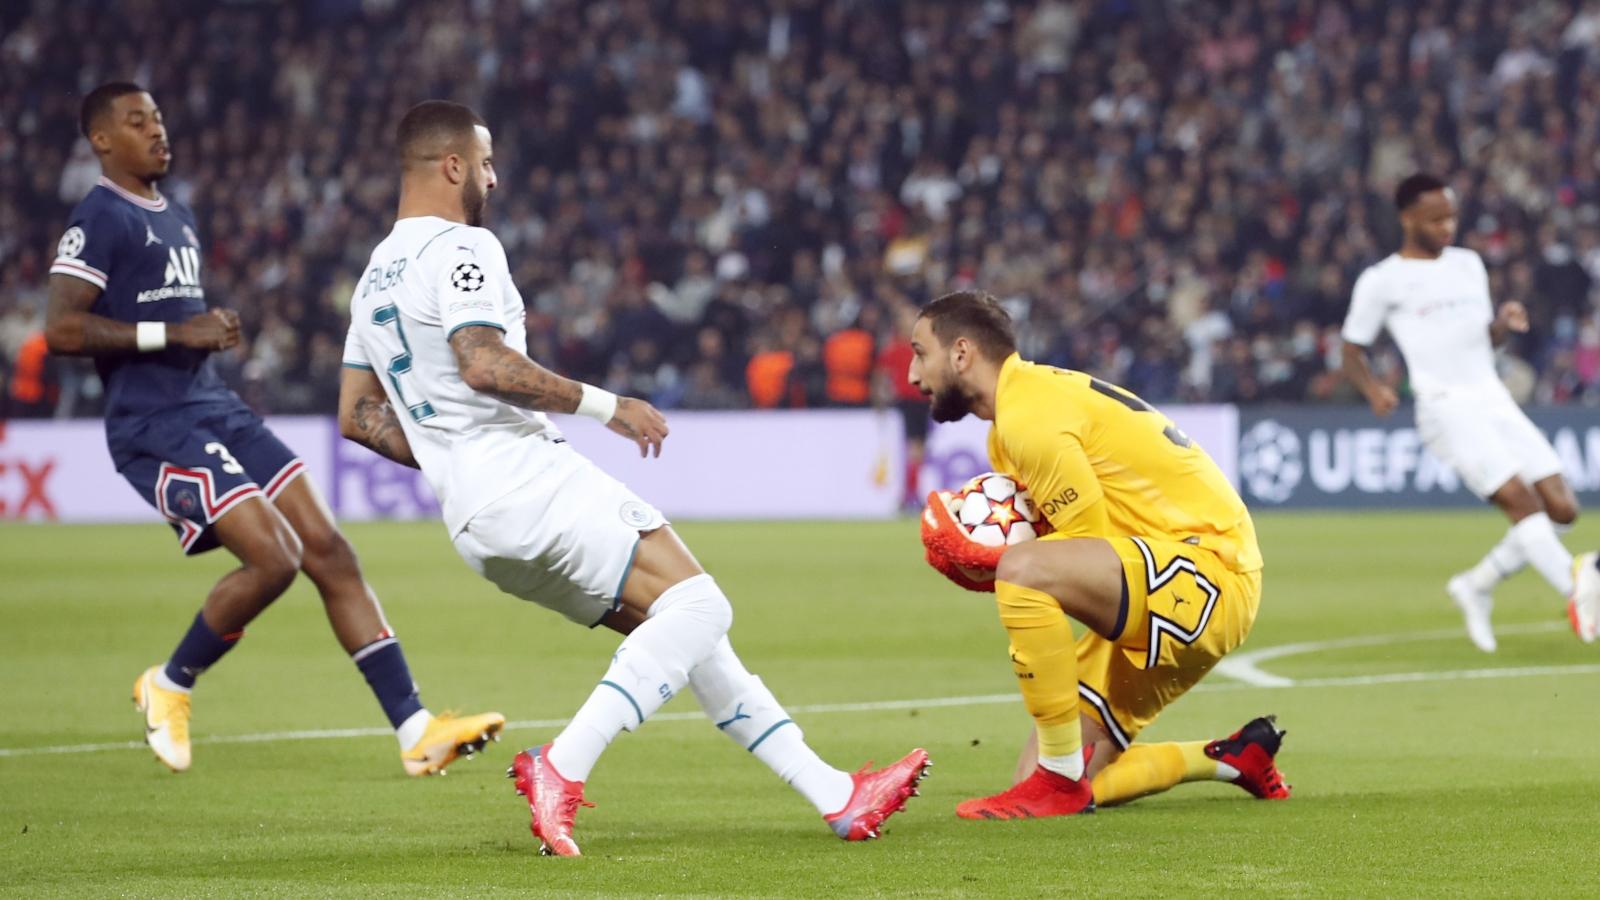 TRỰC TIẾP PSG 0-0 Man City: Trận đấu bắt đầu